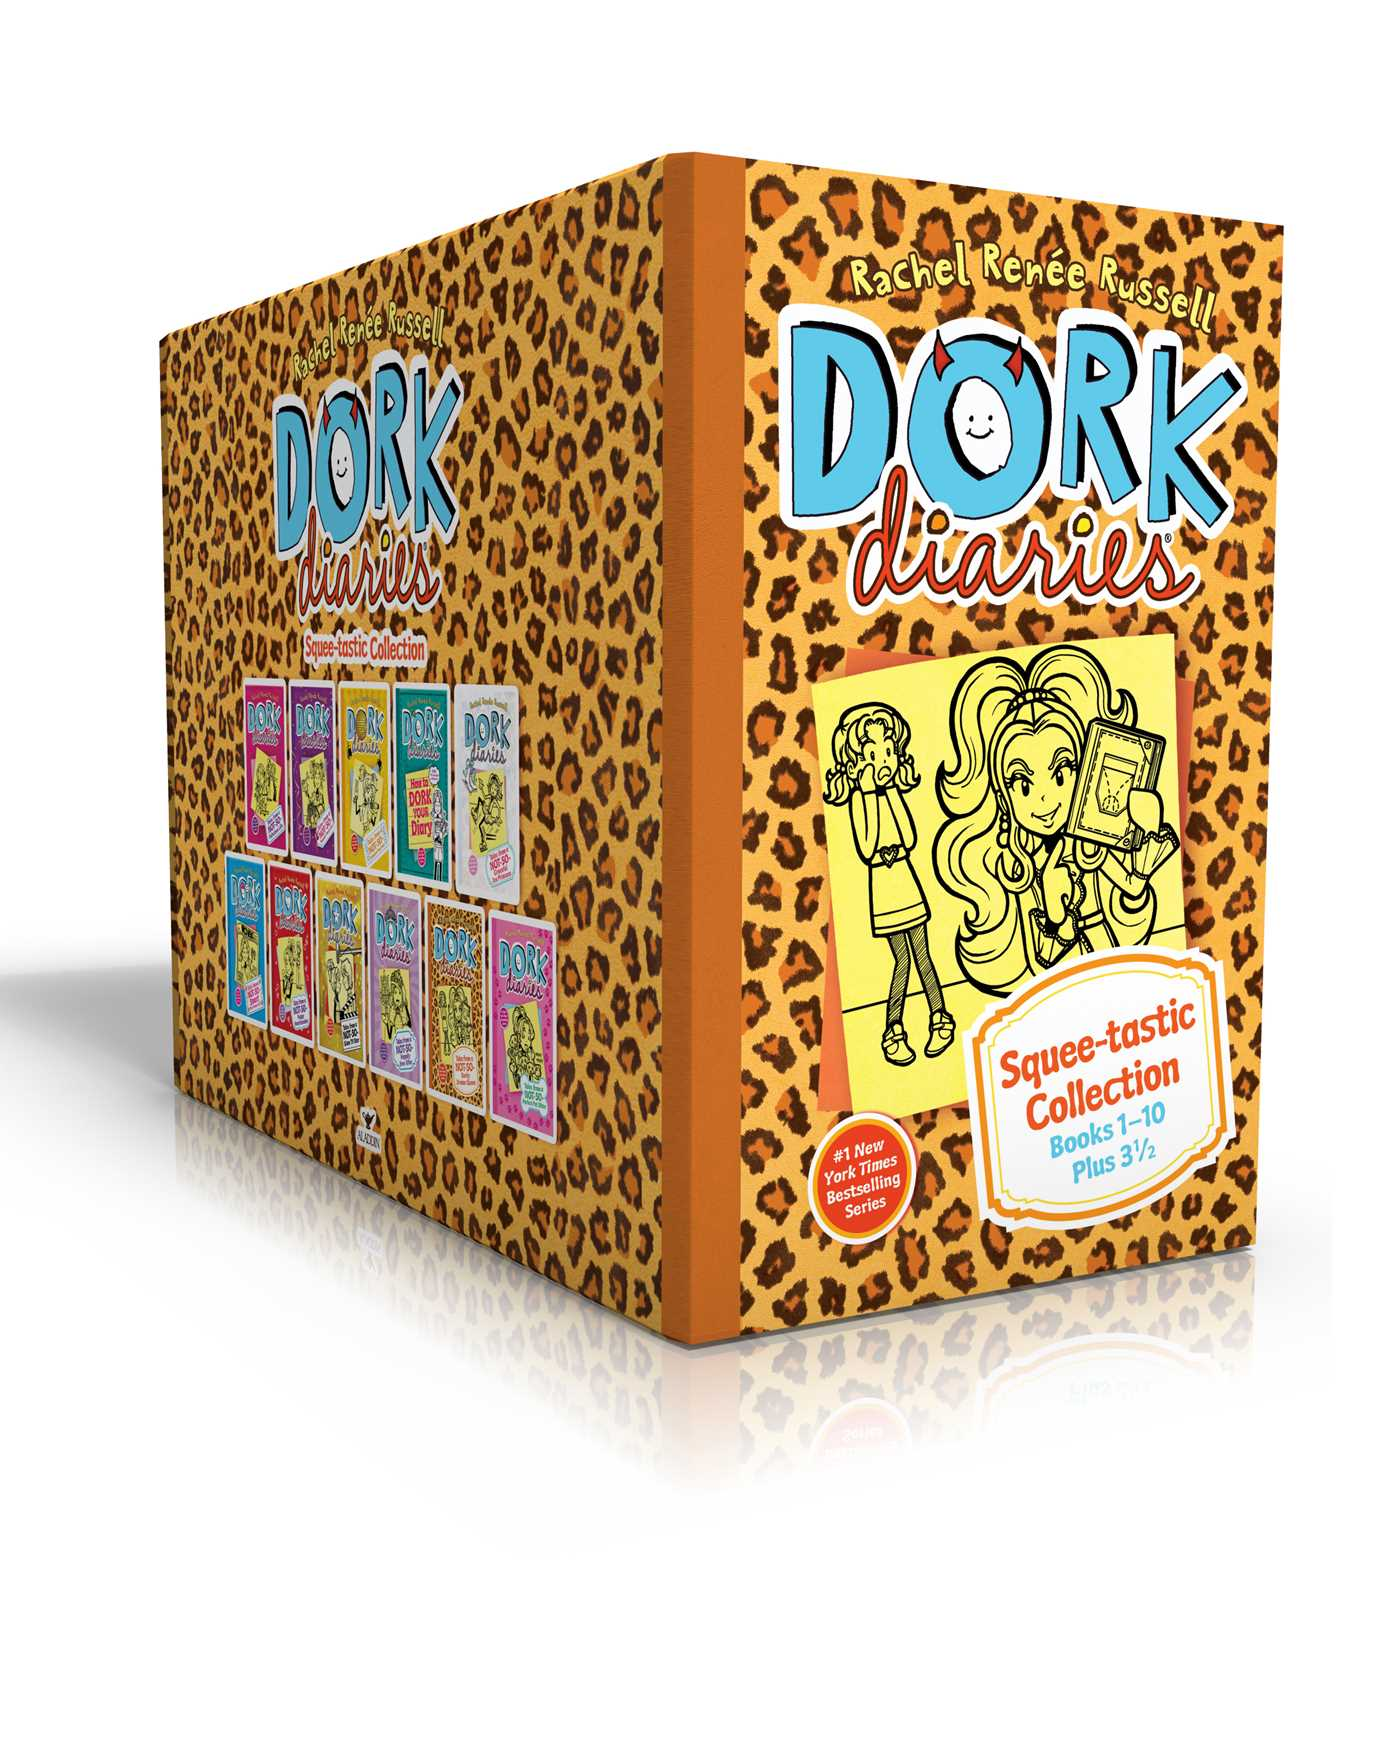 Dork diaries squee tastic collection books 1 10 plus 3 1 2 9781481468879 hr